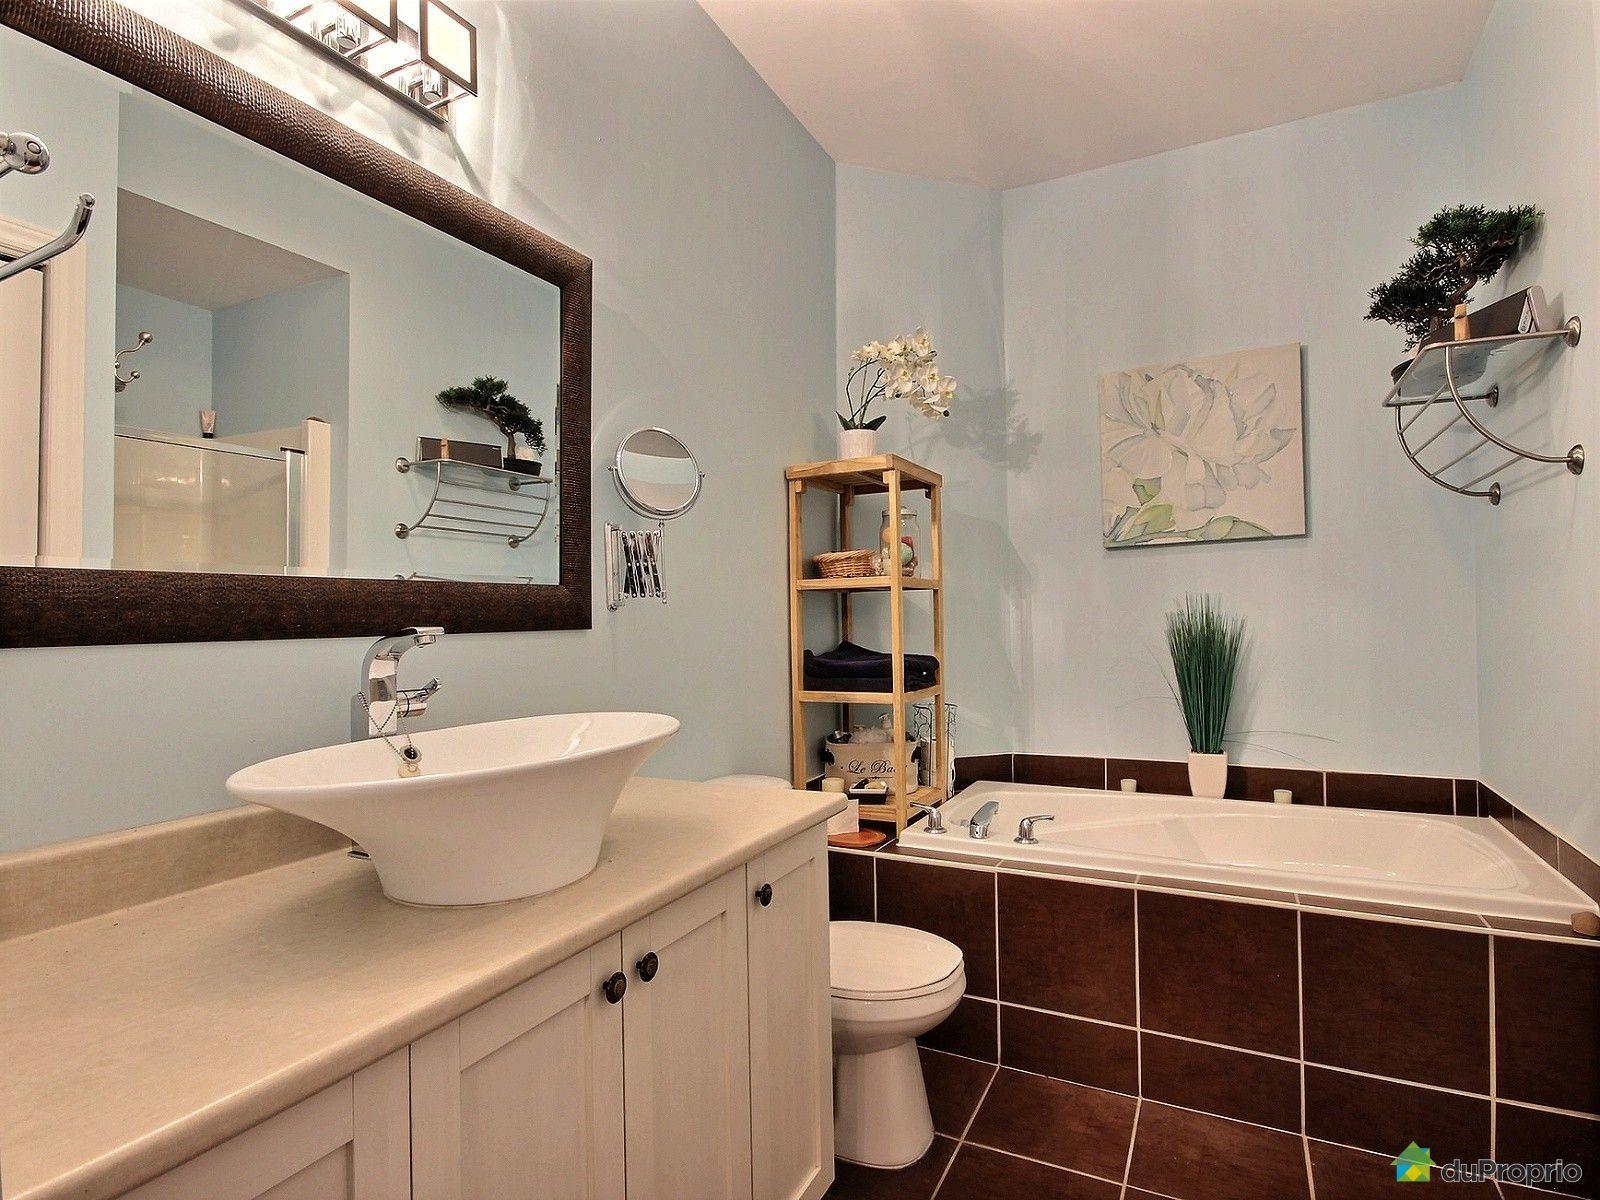 condo vendre montr al 412 7415 rue cl oph e t tu immobilier qu bec duproprio 661847. Black Bedroom Furniture Sets. Home Design Ideas